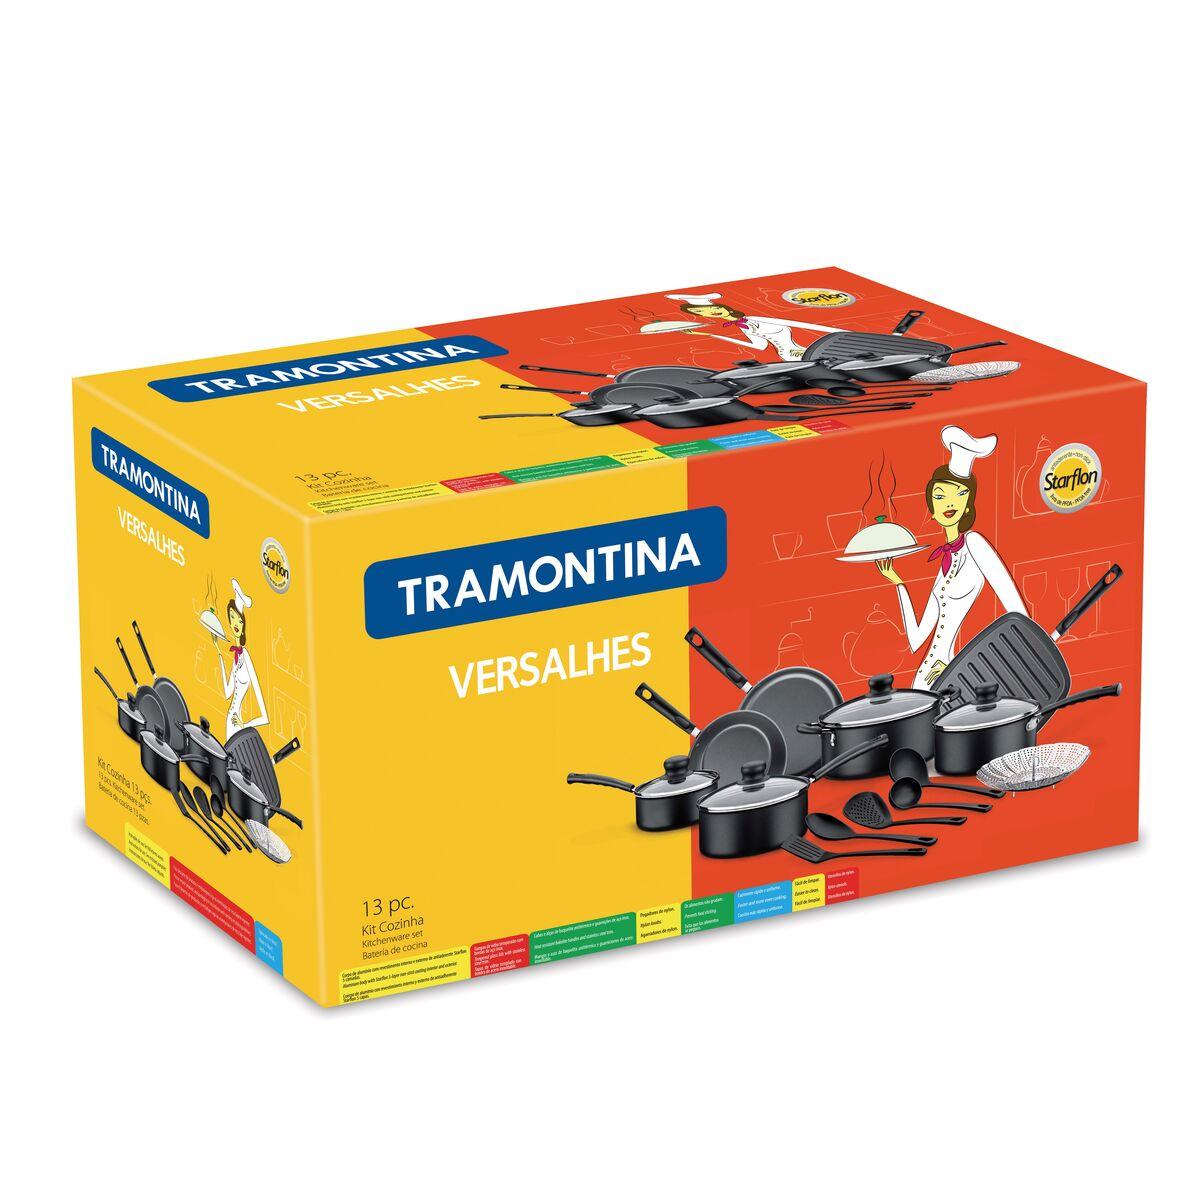 Tramontina - Aluminum cookware set with internal non-stick coating ...